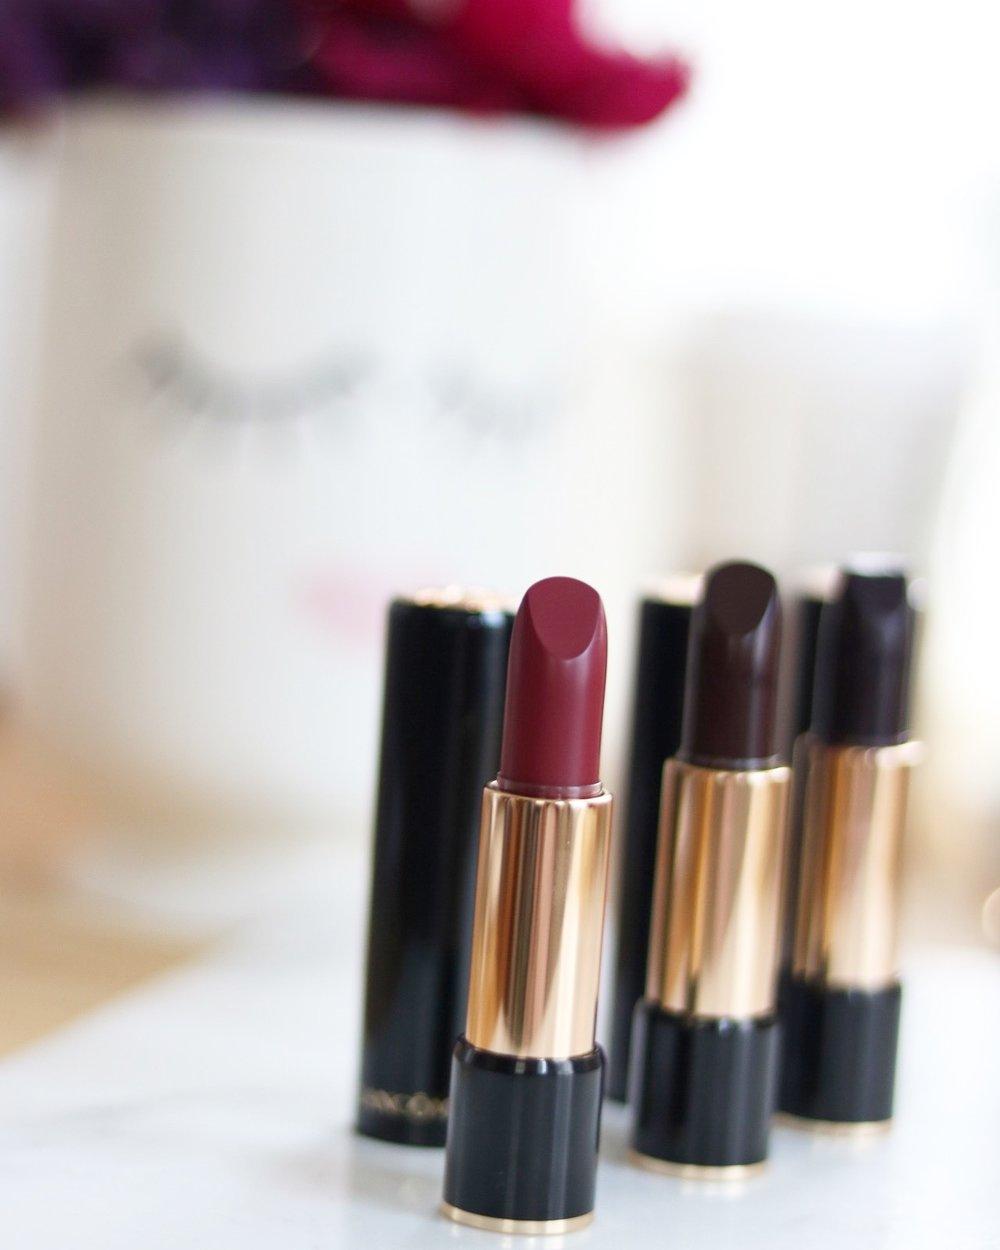 Lancome L'Absolu Rouge Hydrating Lipstick